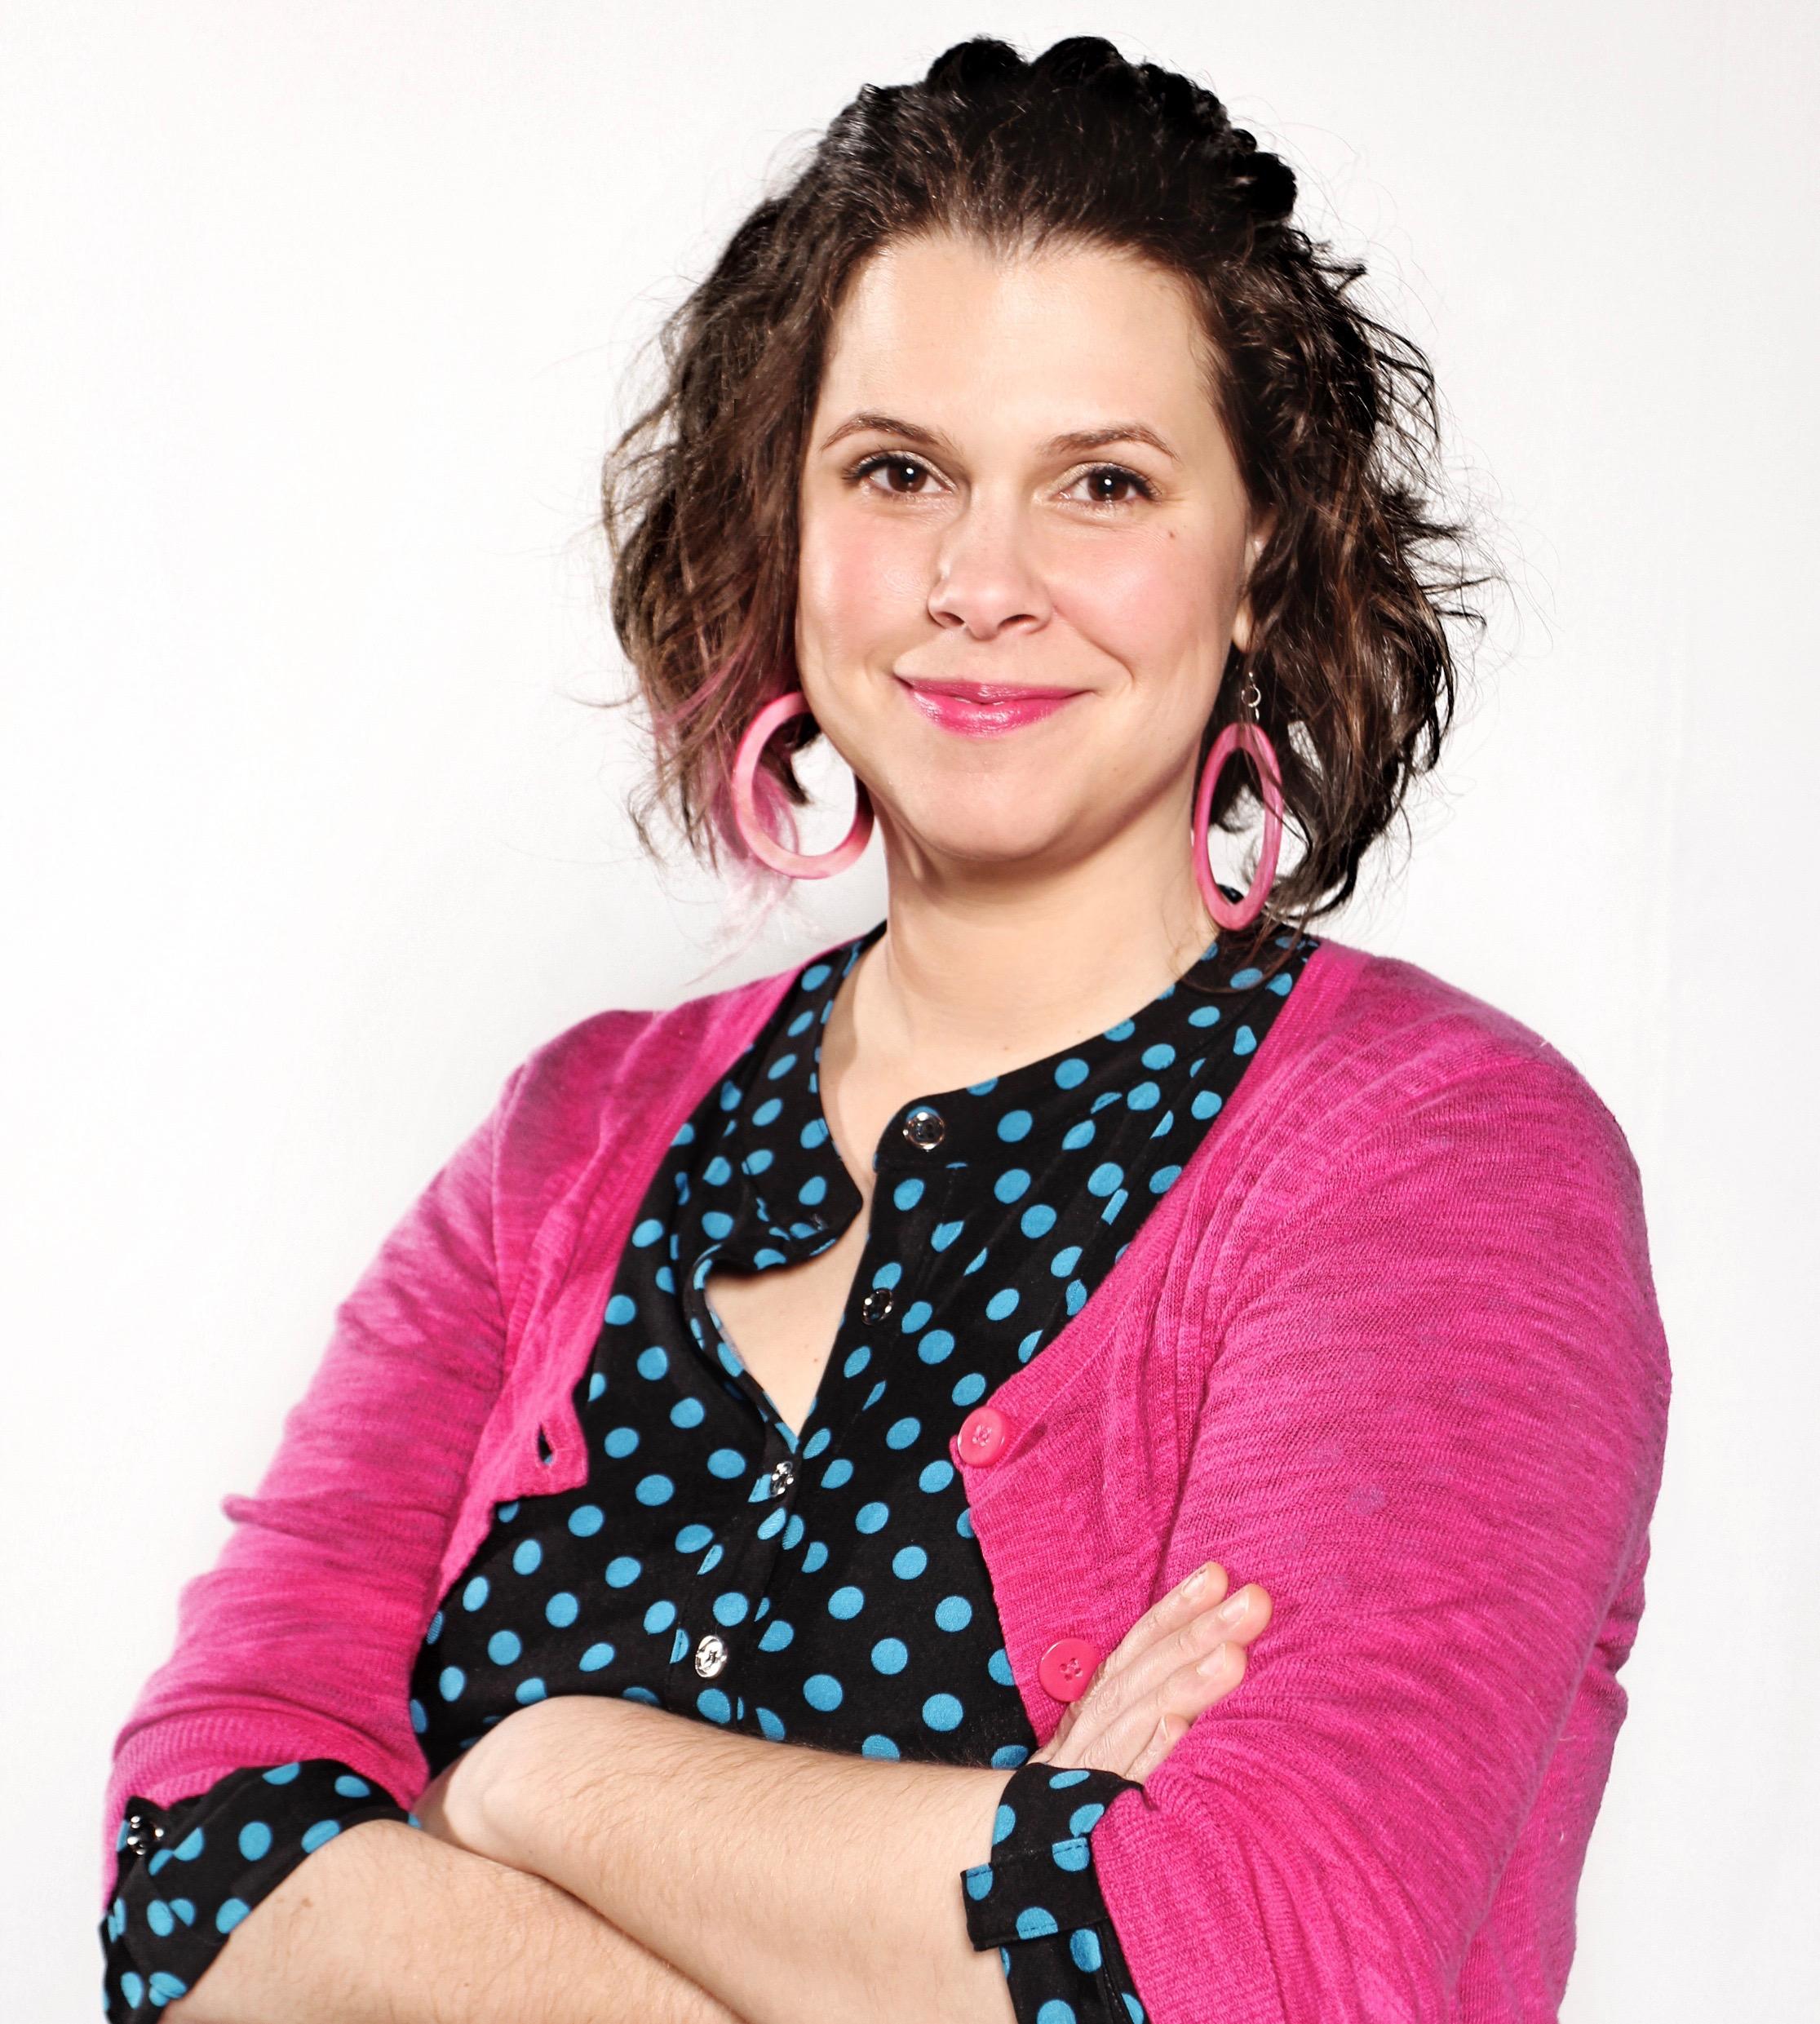 Julie Bates MacGillis